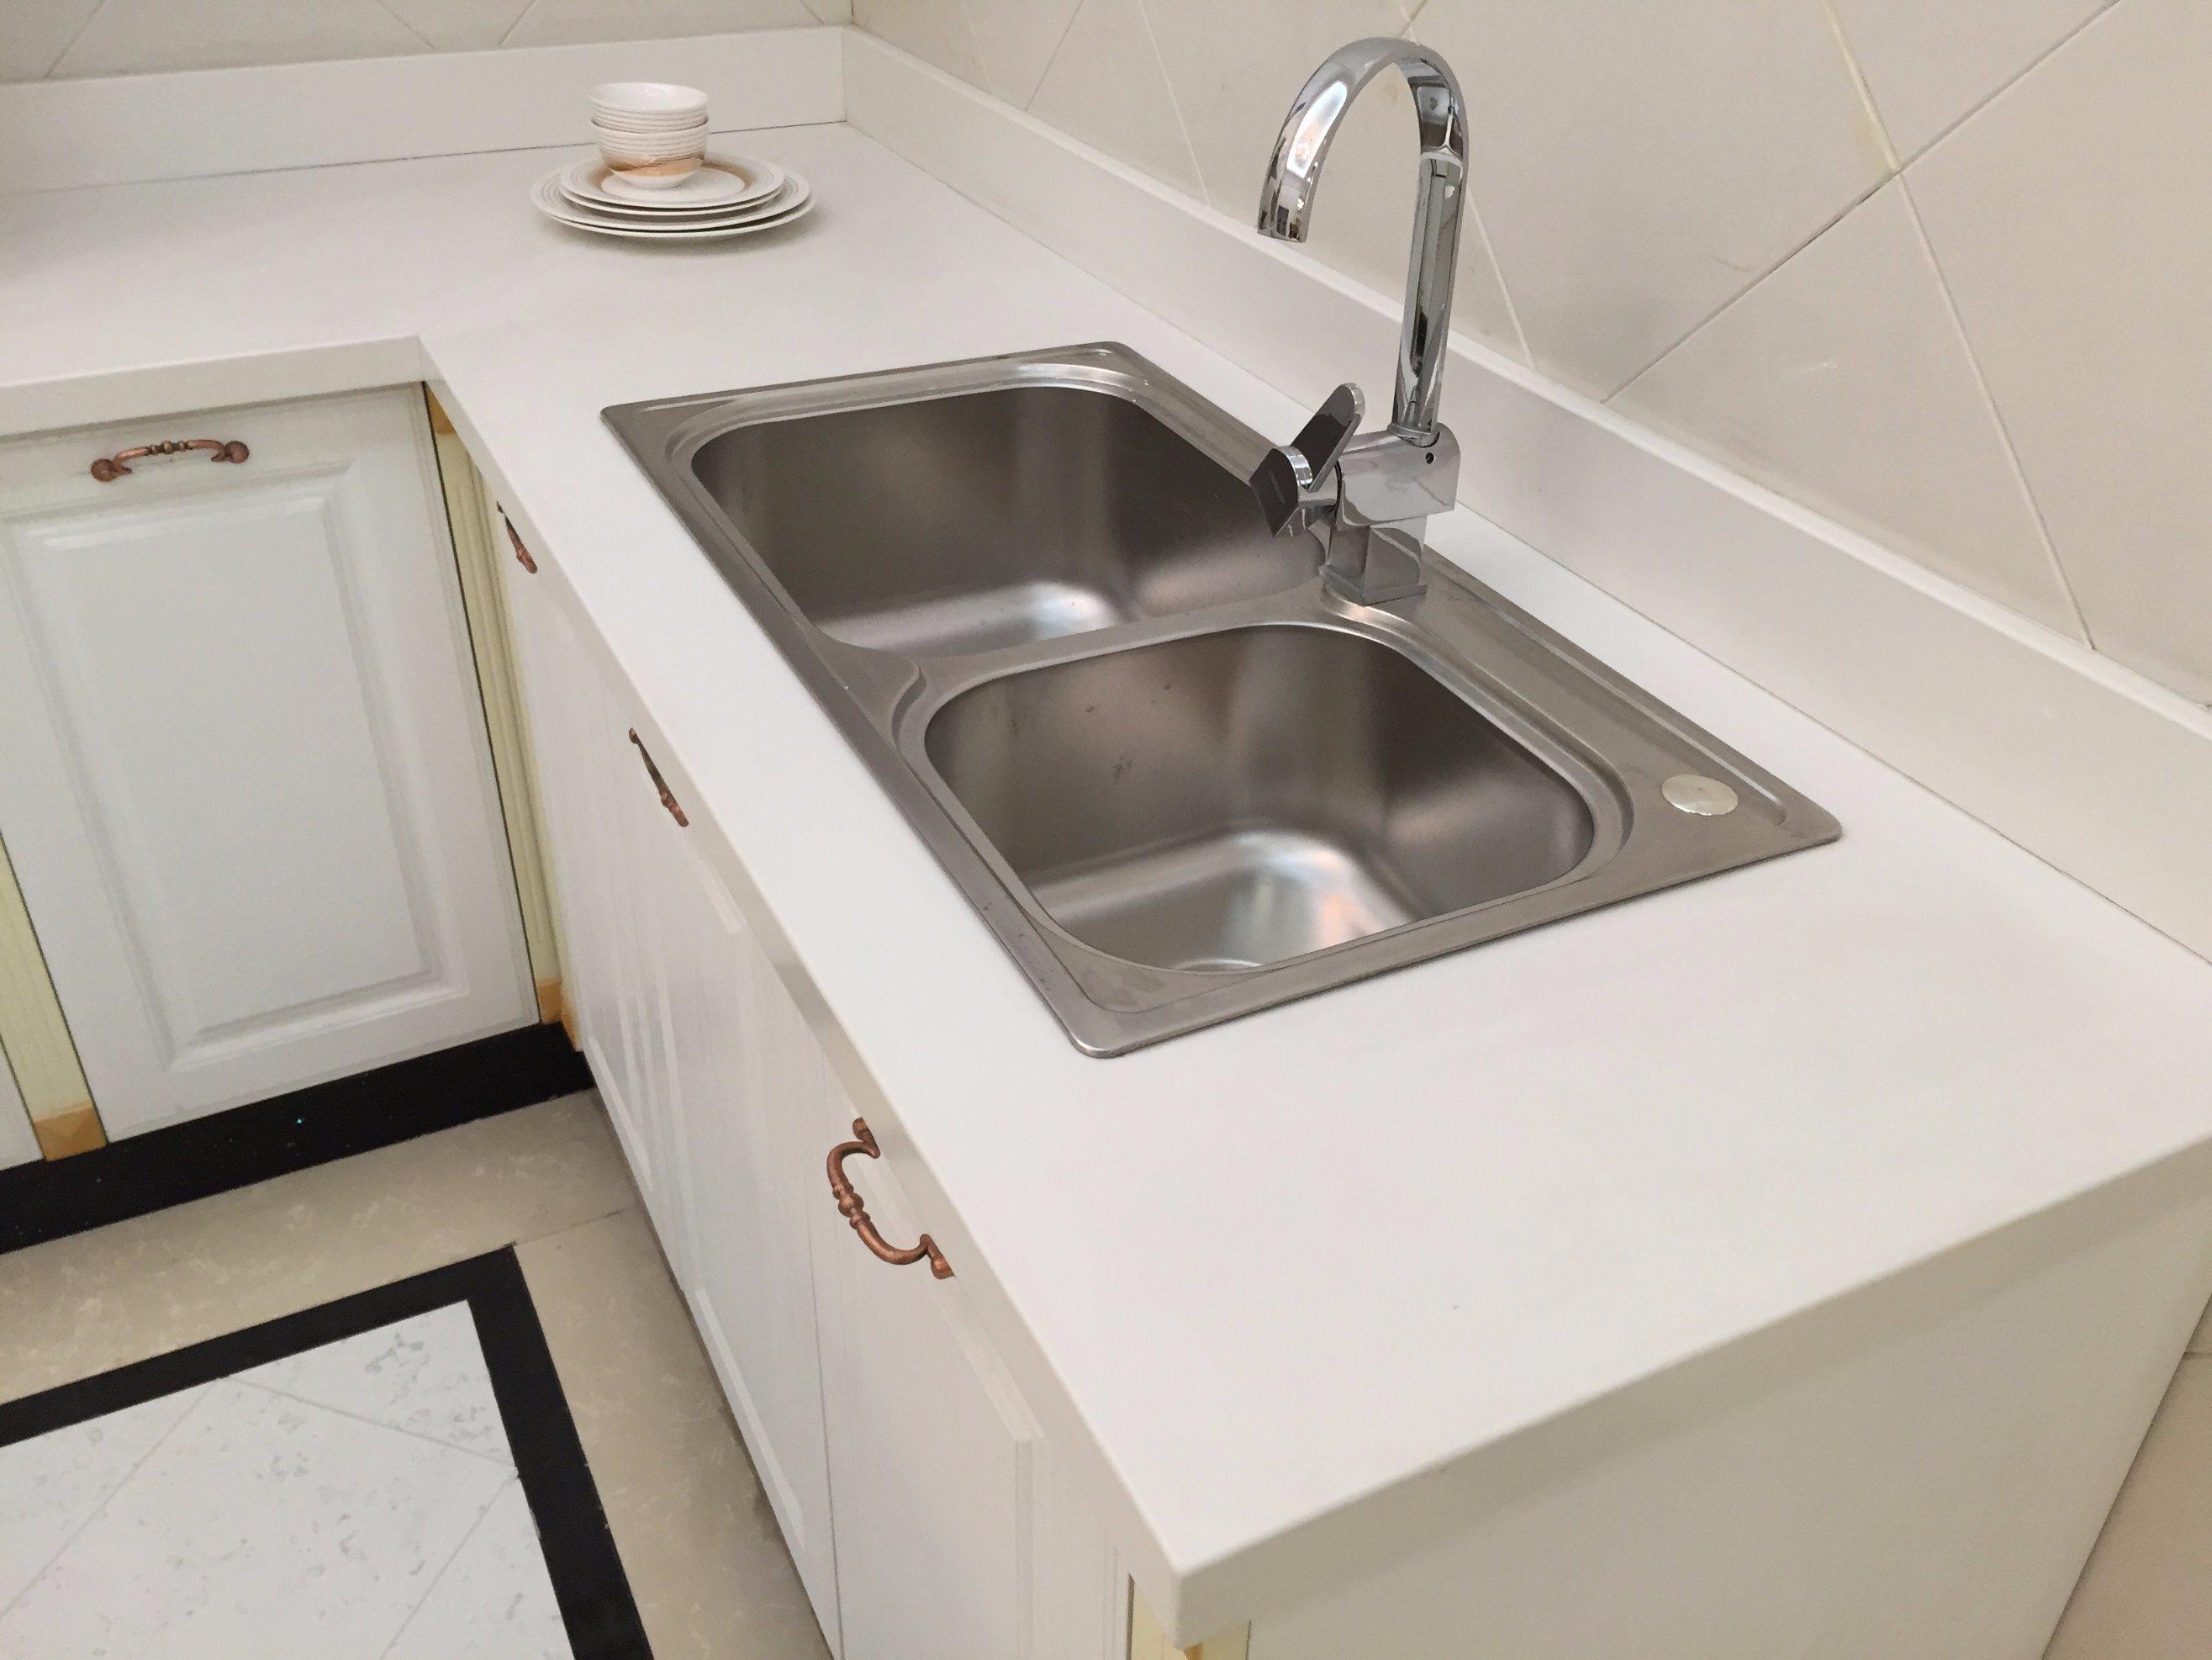 Engineered Quartz /Granite /Marble/Table/ Work/Solid/ Natural Stone/Kitchen/Bathroom Countertop